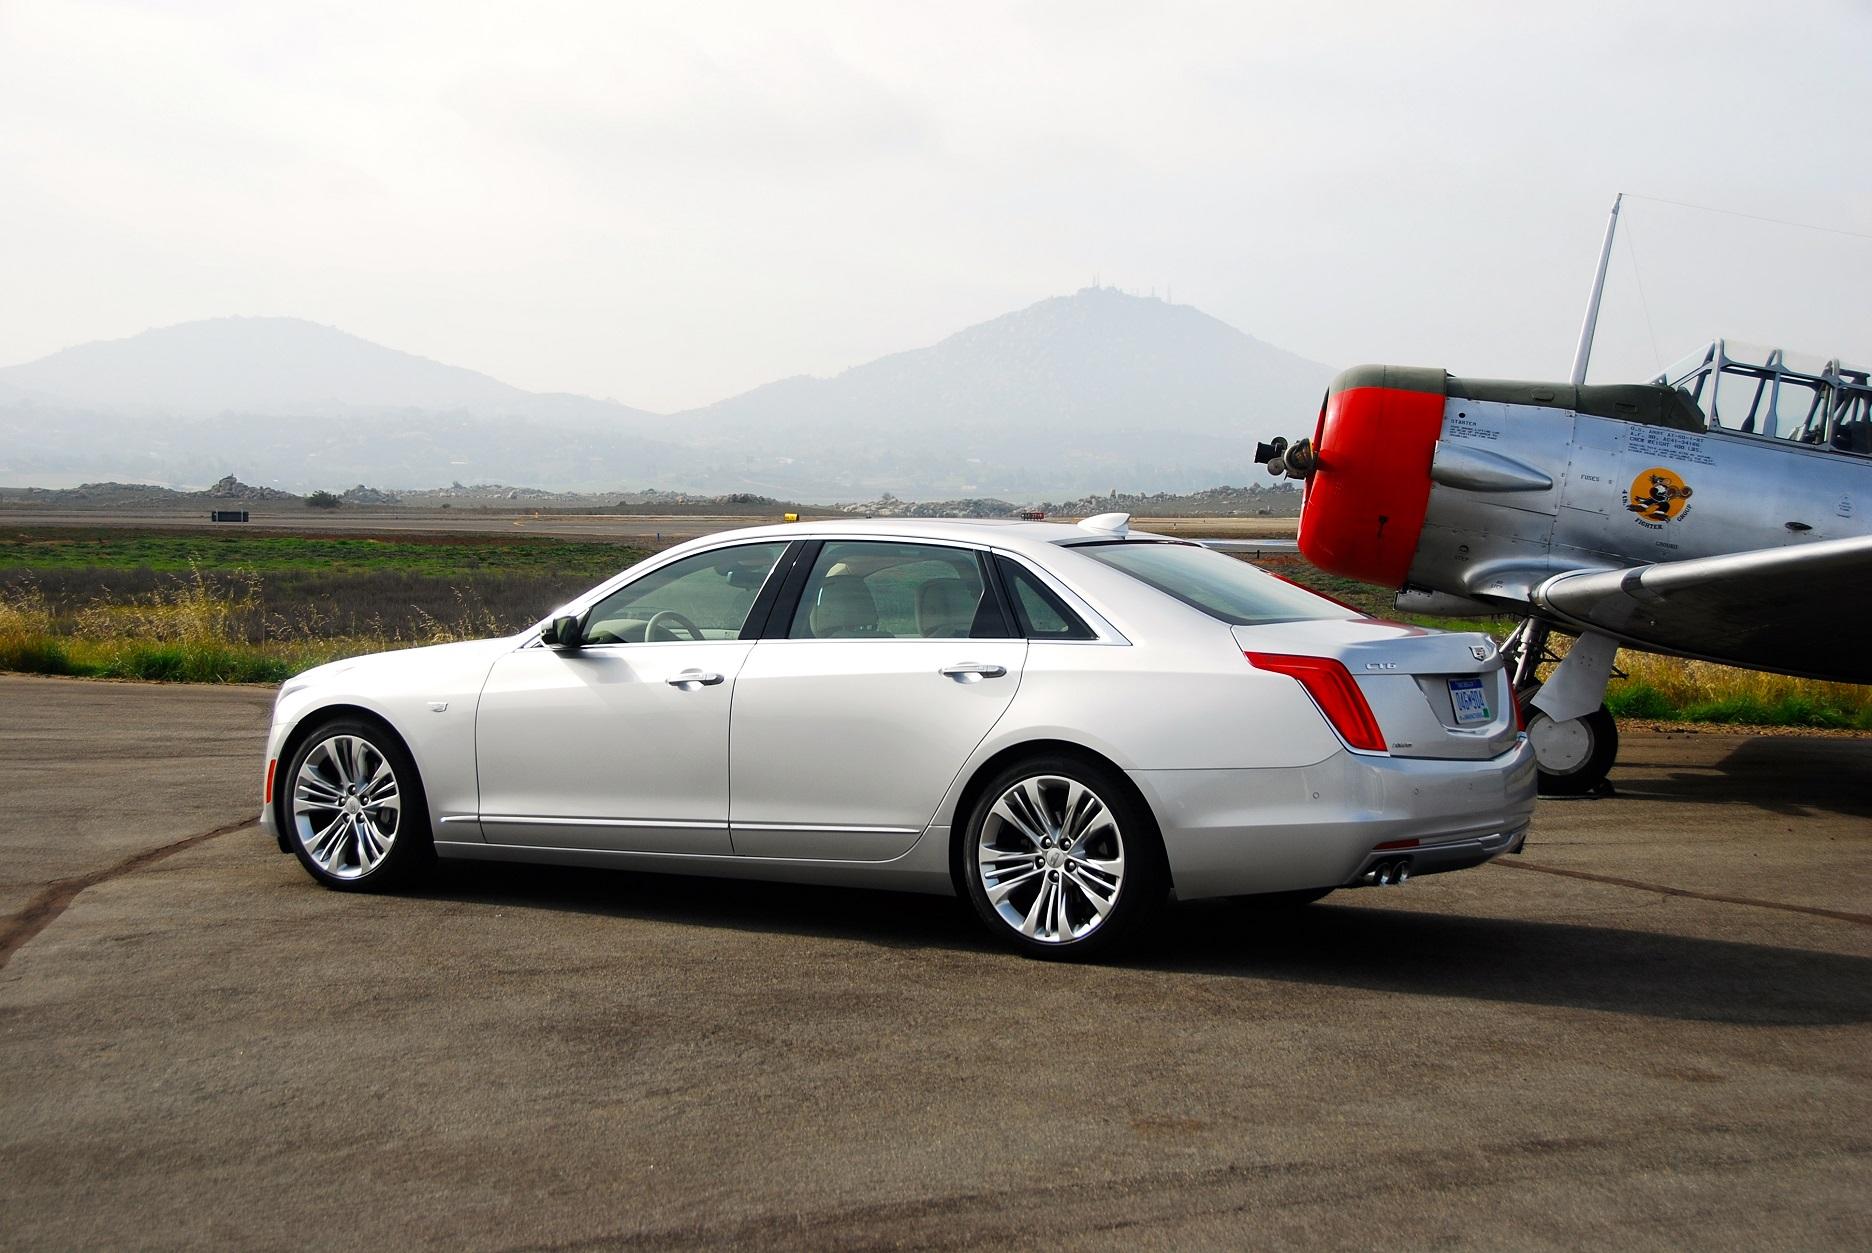 The 2017 Cadillac CT6